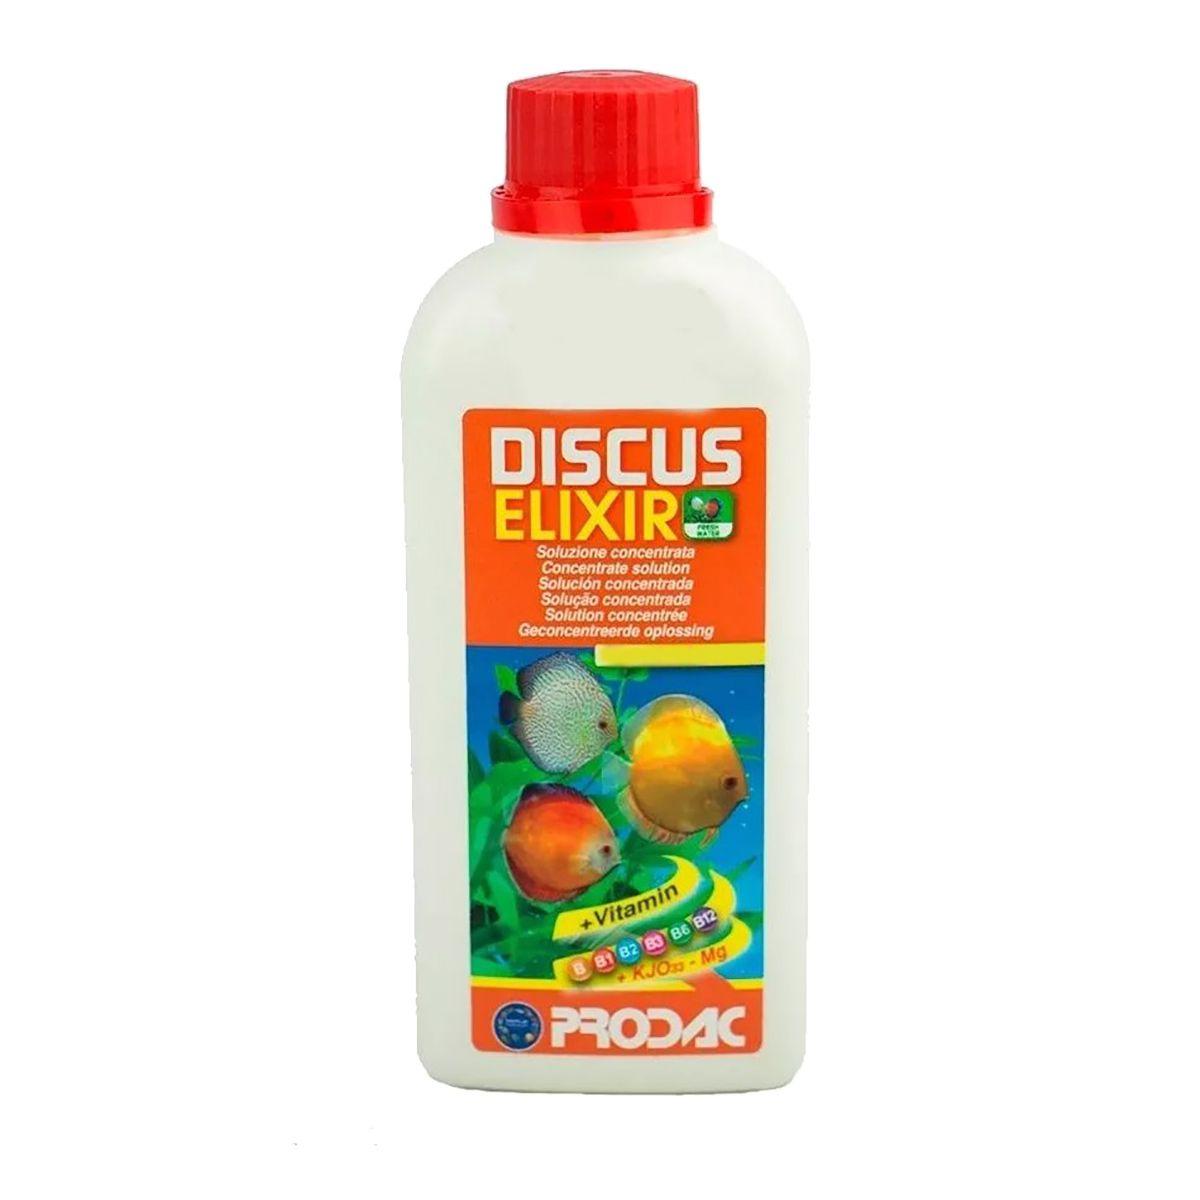 Prodac Discus Elixir 250ml Vitamina Para Discos Dose 500 lts